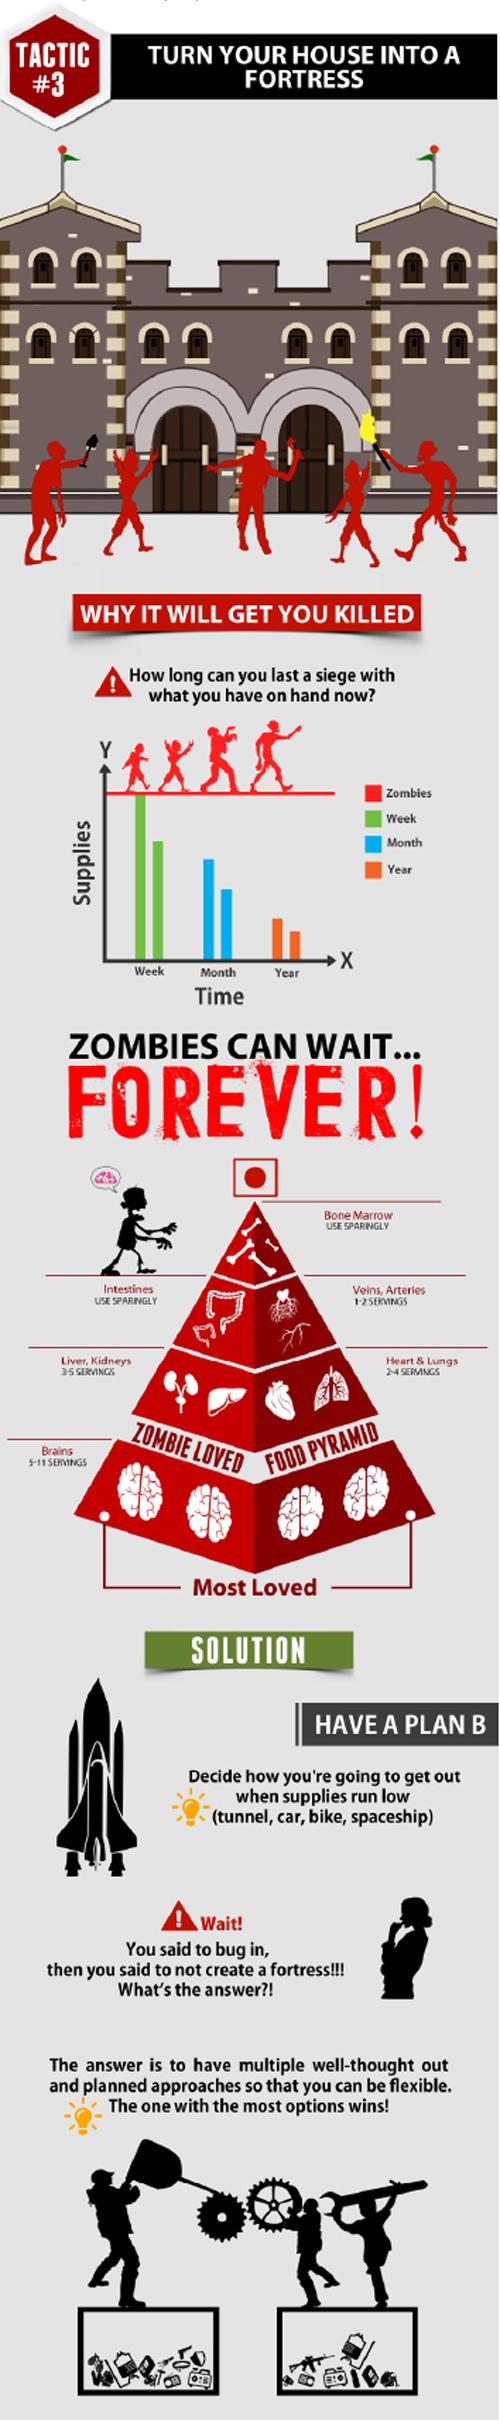 ZombiesInfographic04